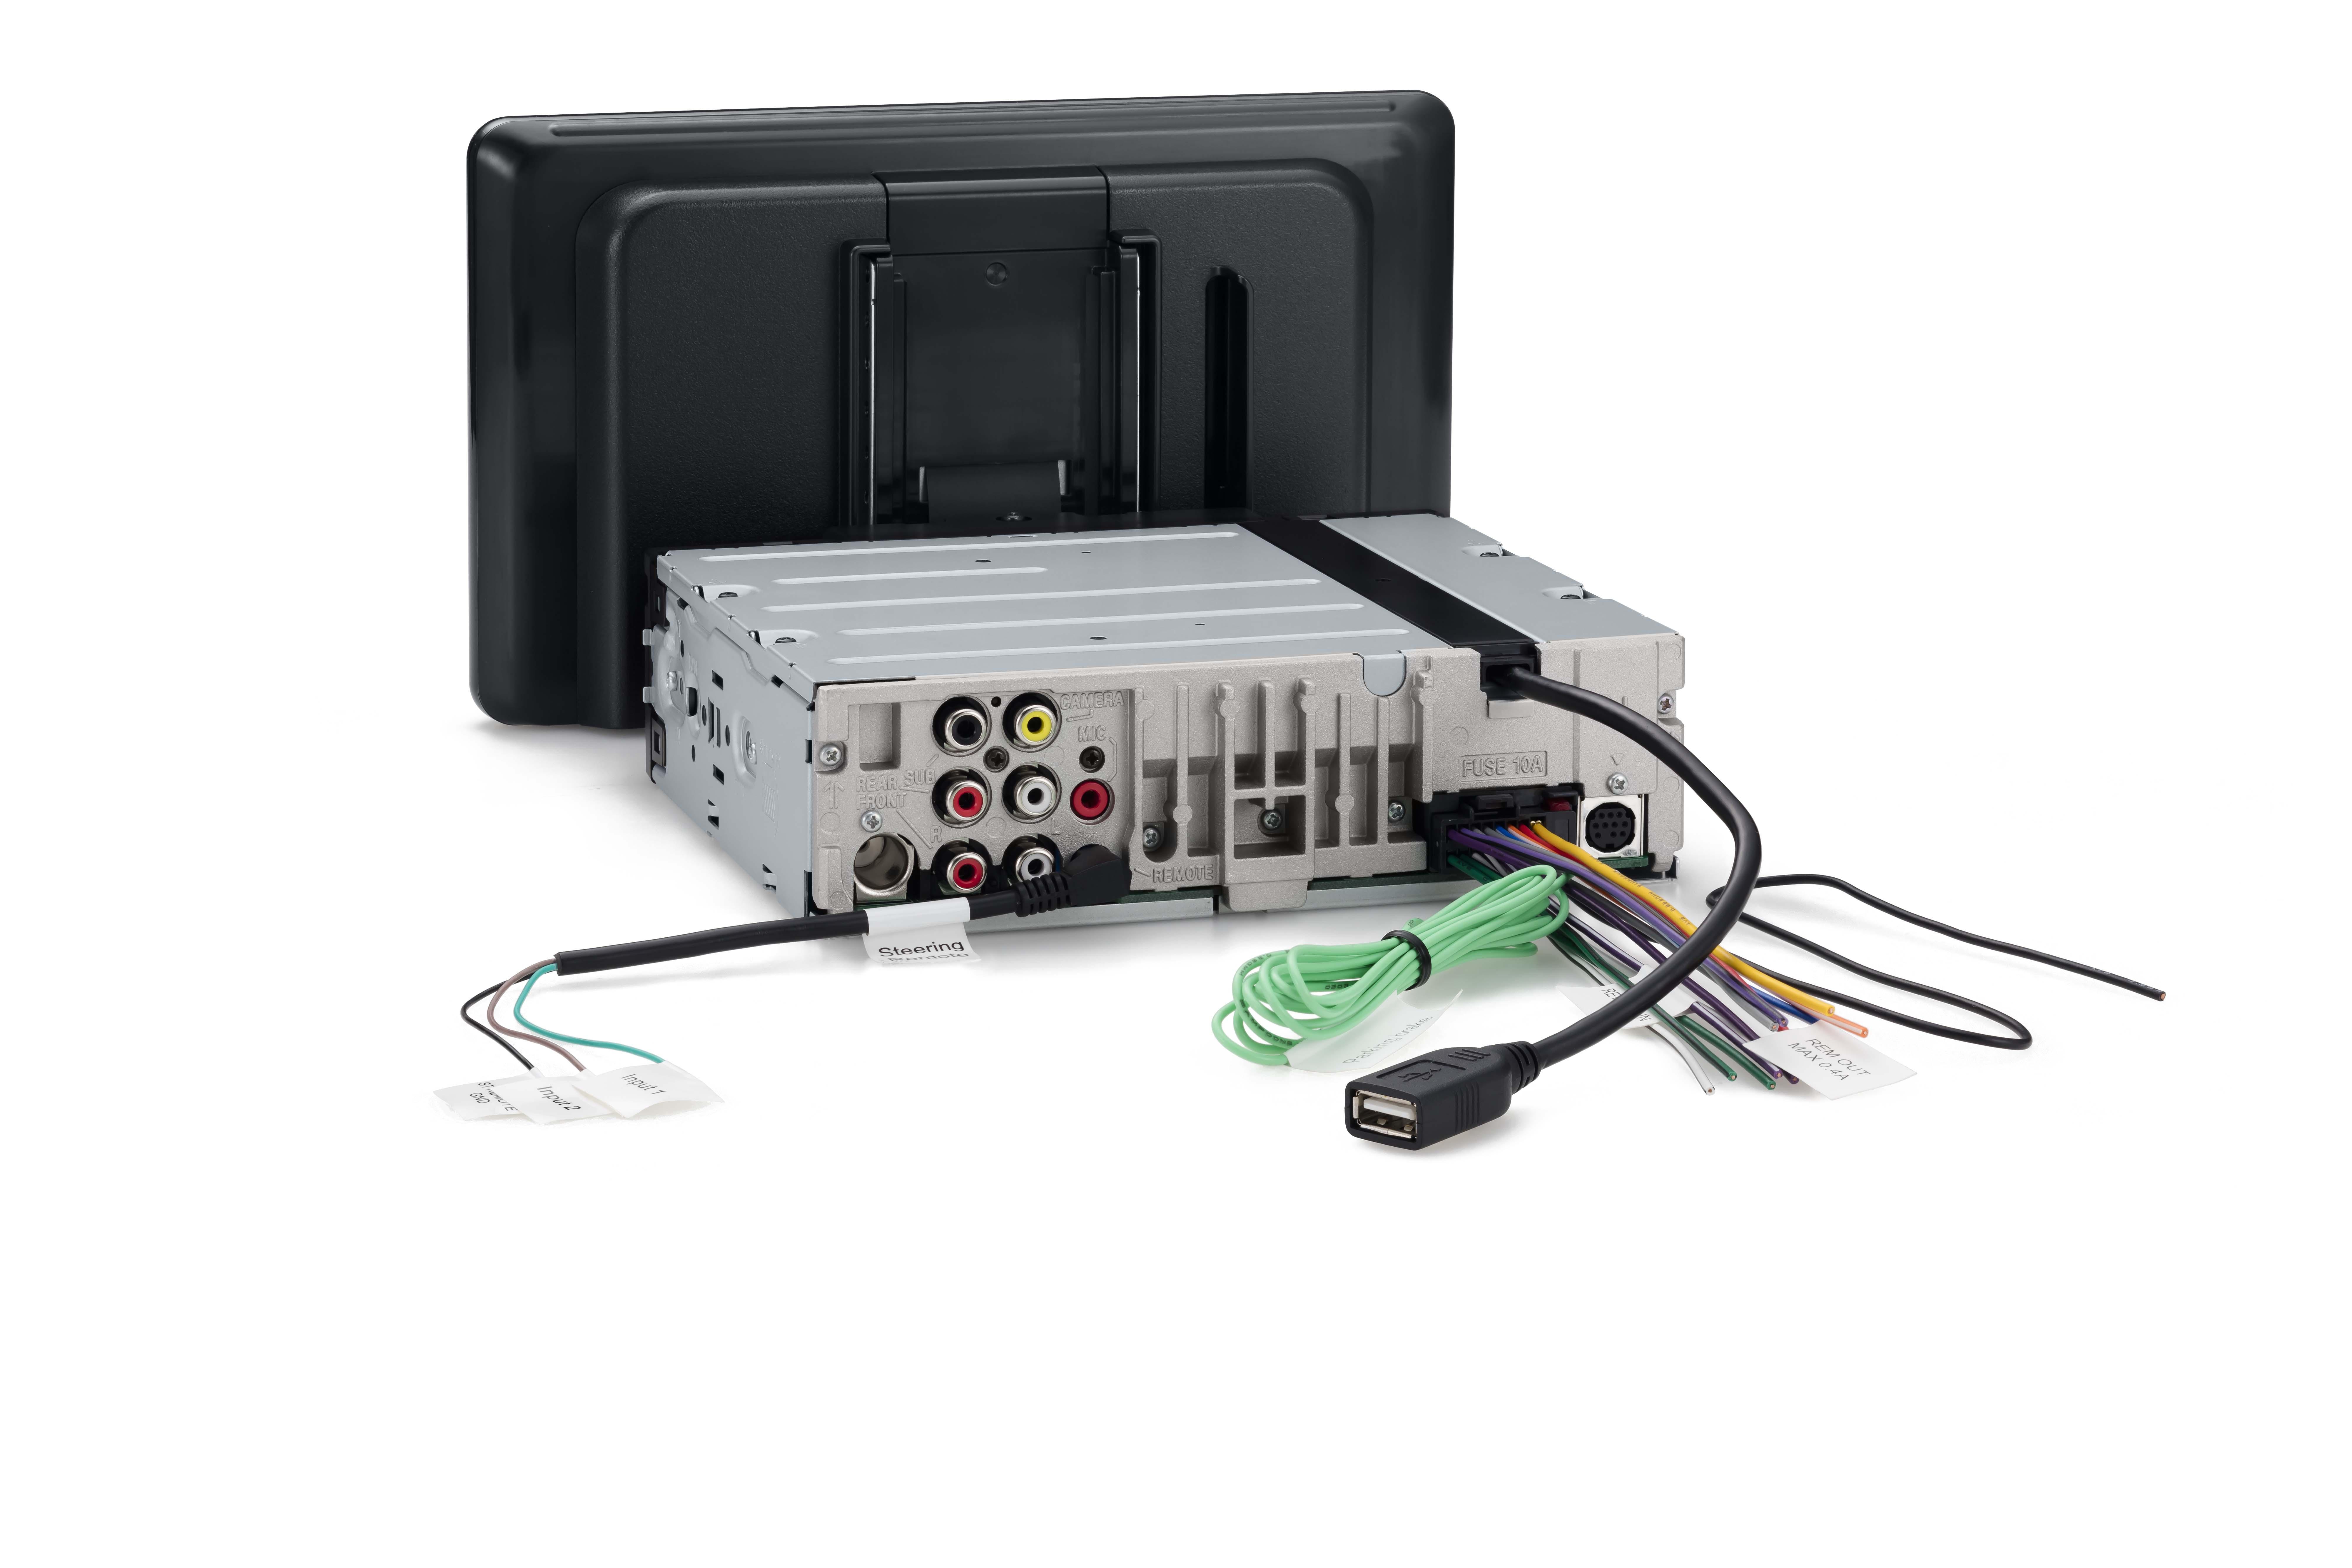 XAV-AX8100_UCIN_Rear_with_Cables__TifLayered_